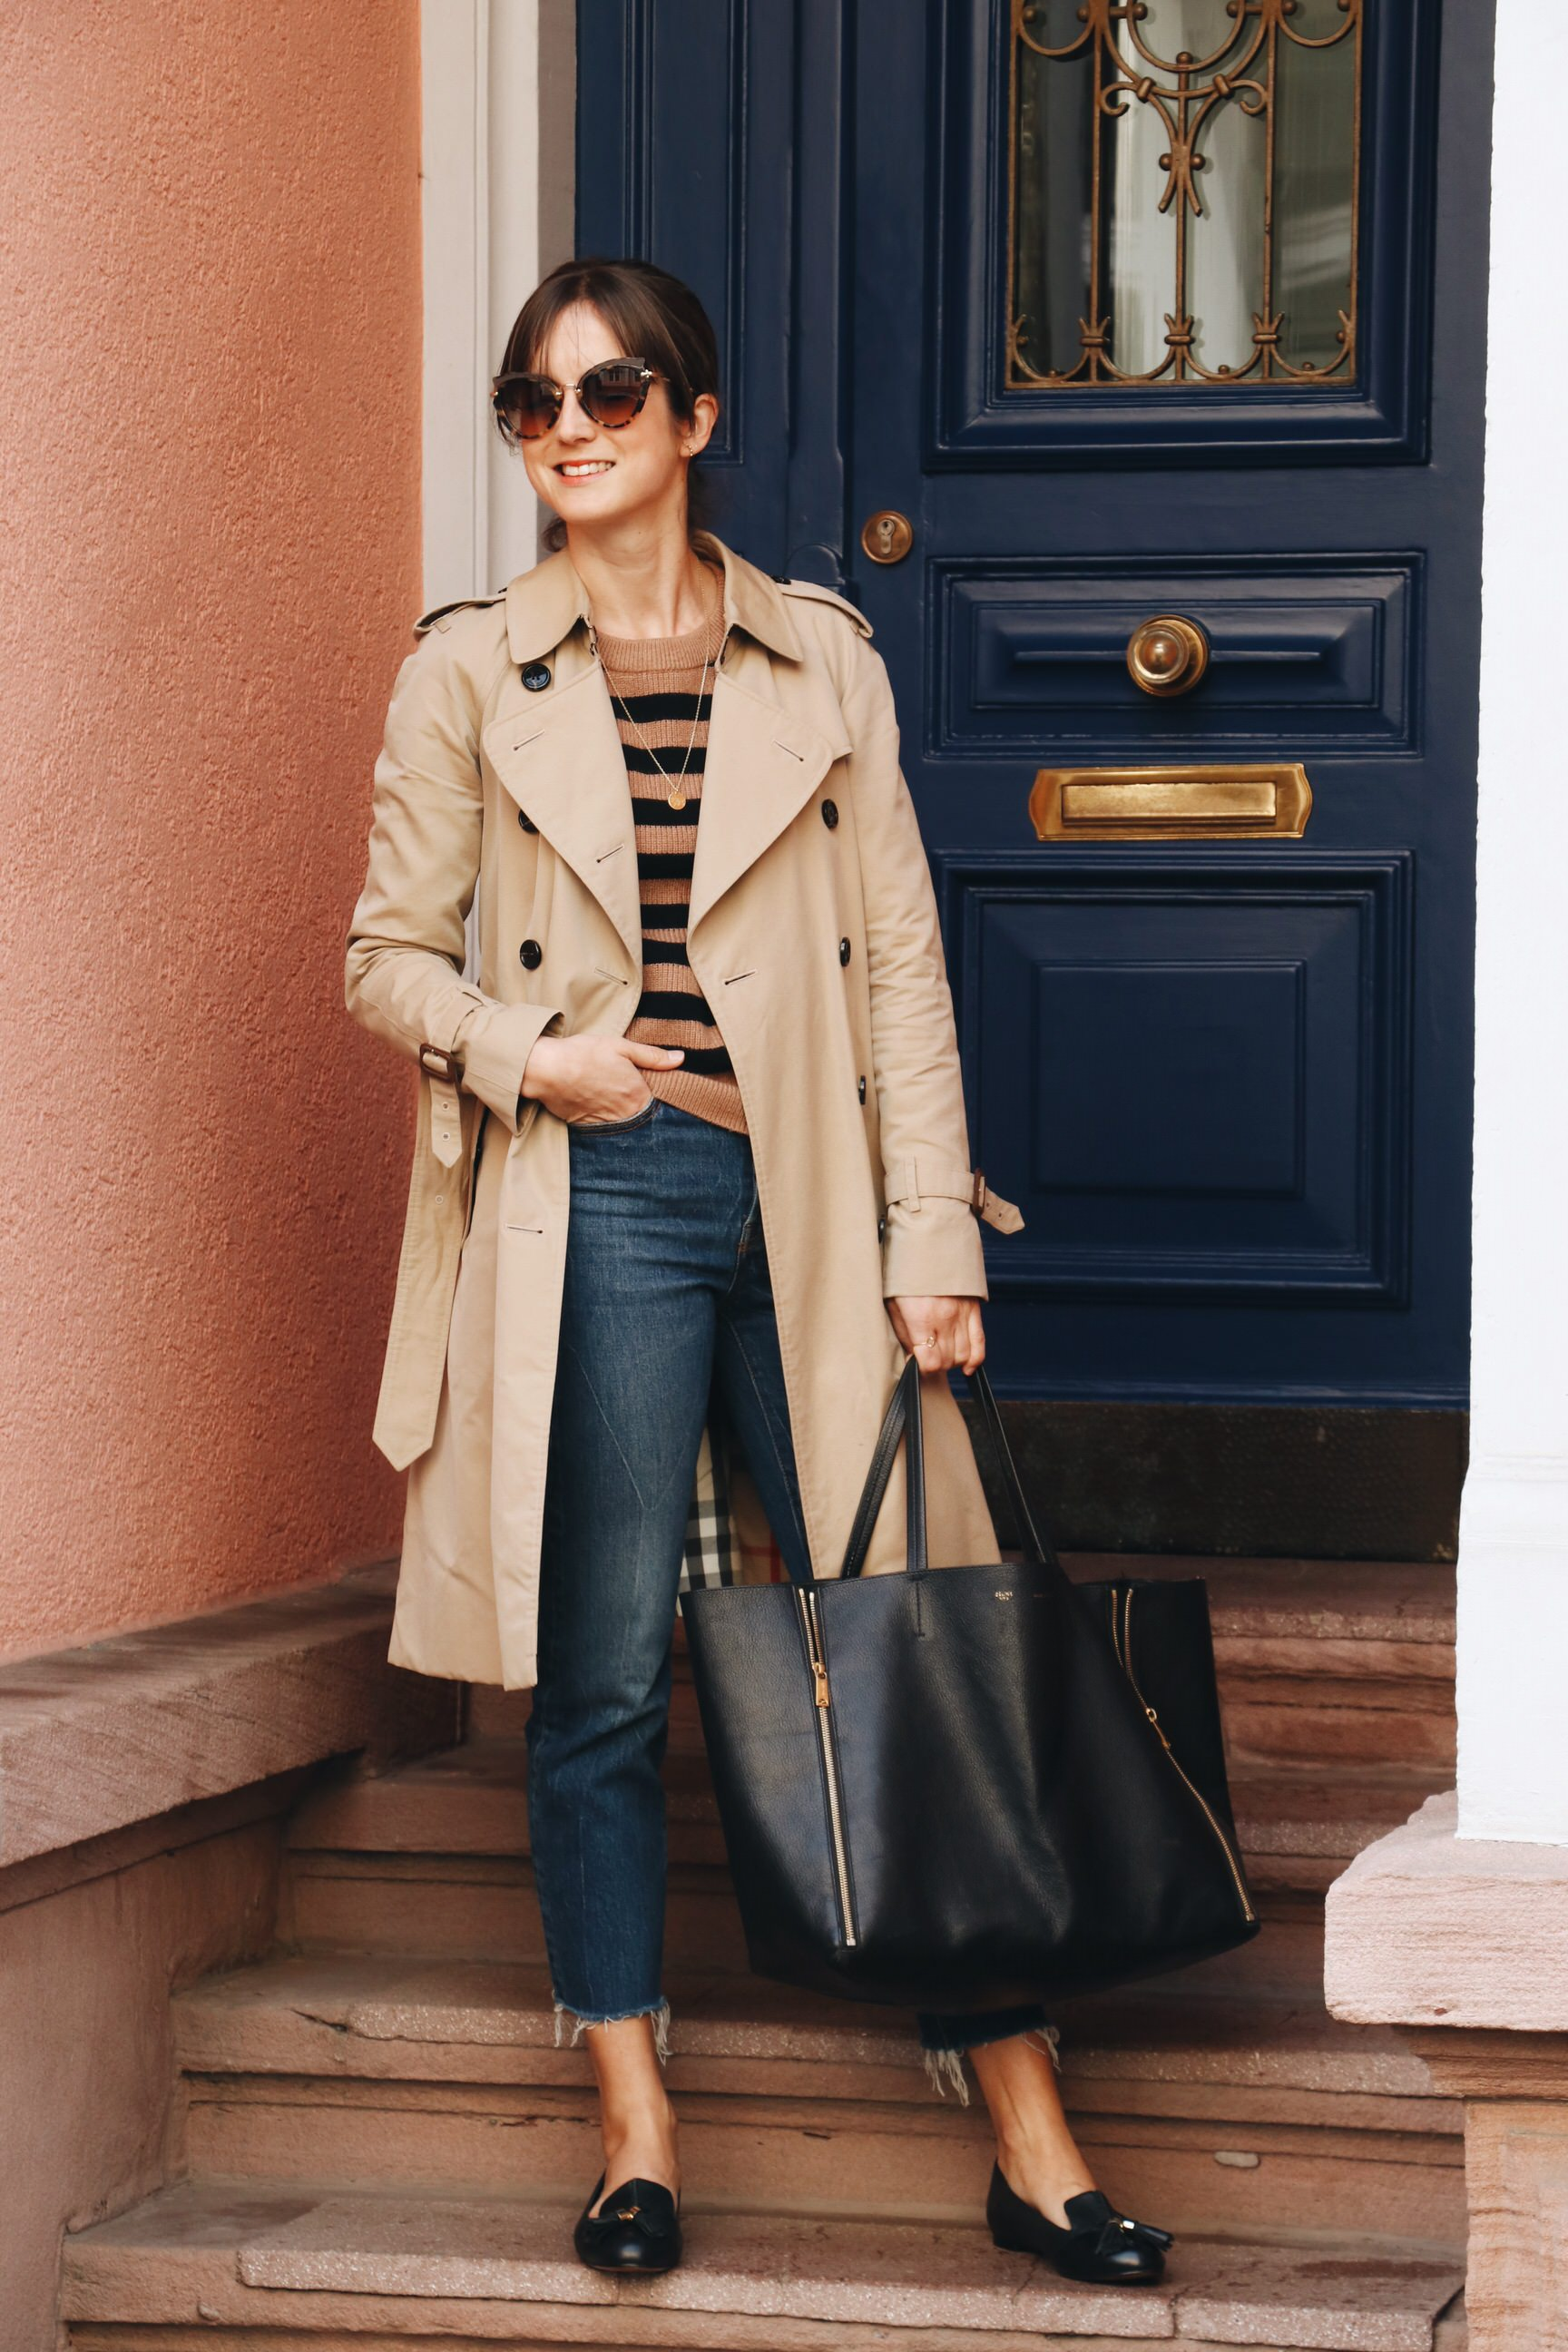 Herbst Look Trenchcoat kombinieren Outfit Modeblog Fashionblog Deutschland Blogger